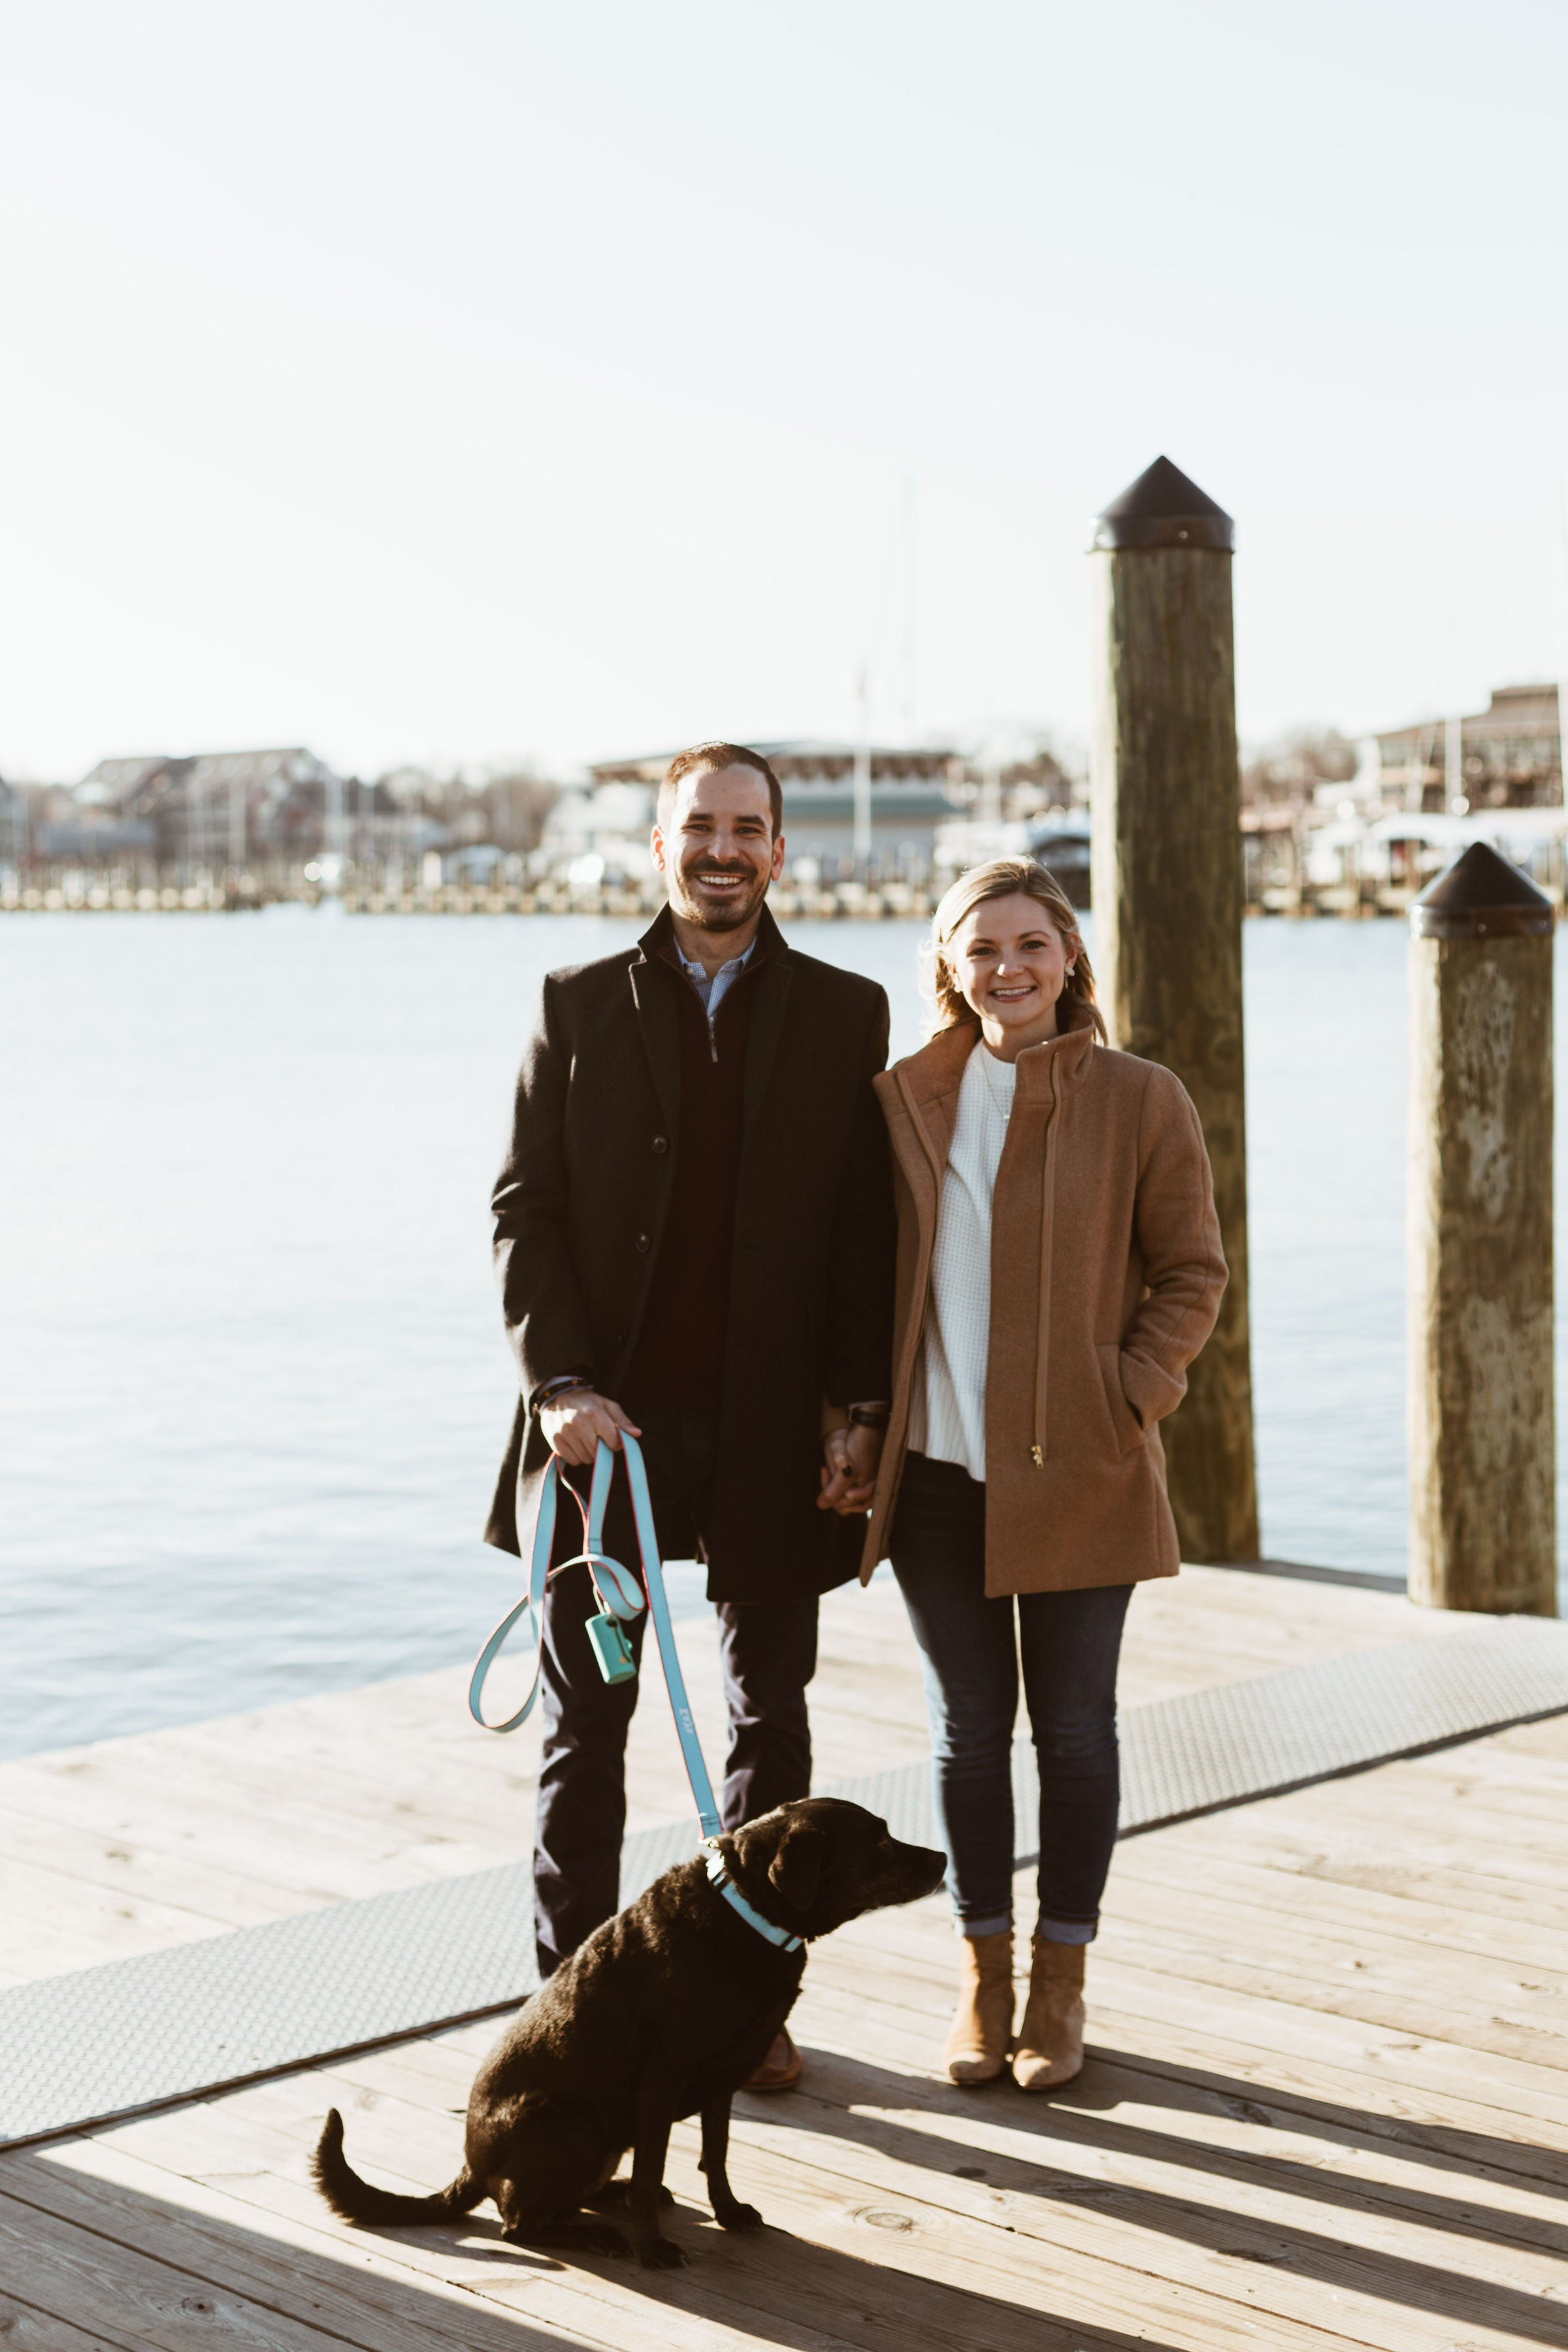 Jason Dall'Acqua, women and dog